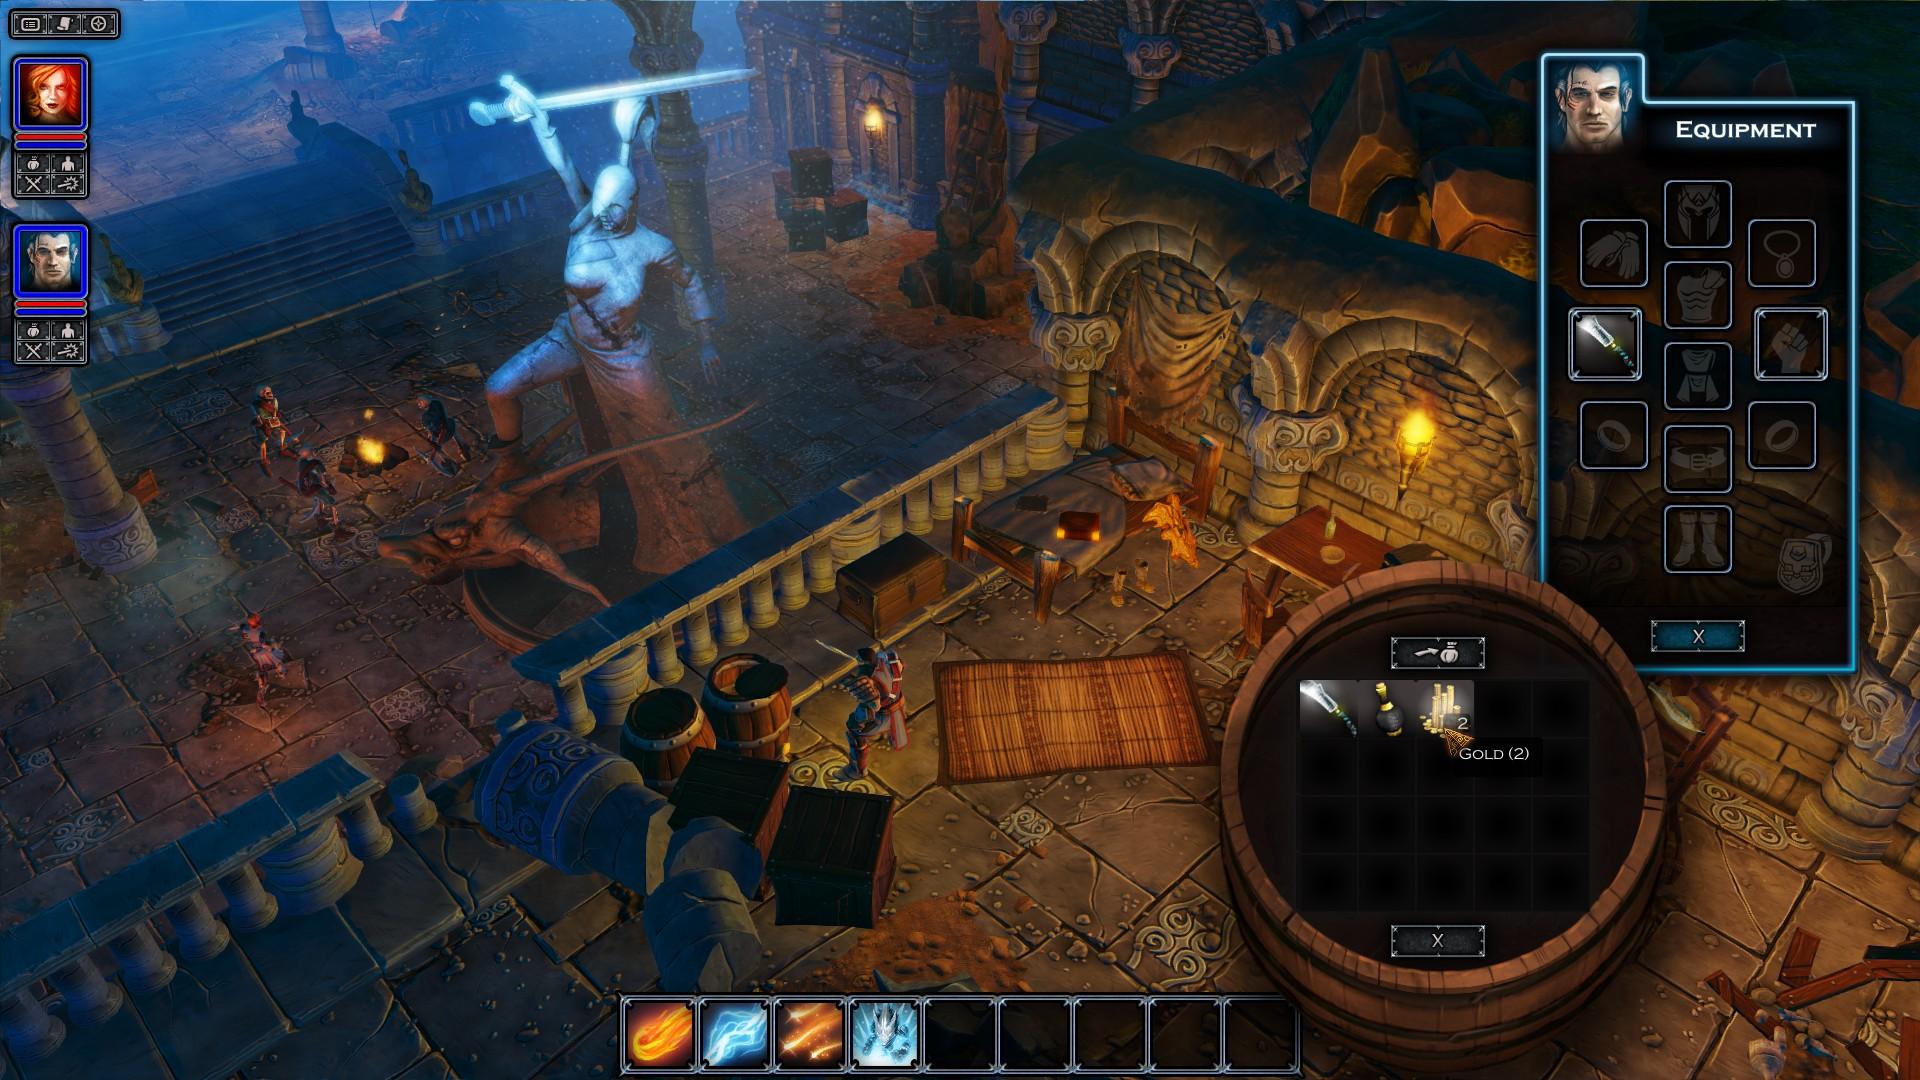 Divinity: Original Sin finds success on Kickstarter, Larian Studios